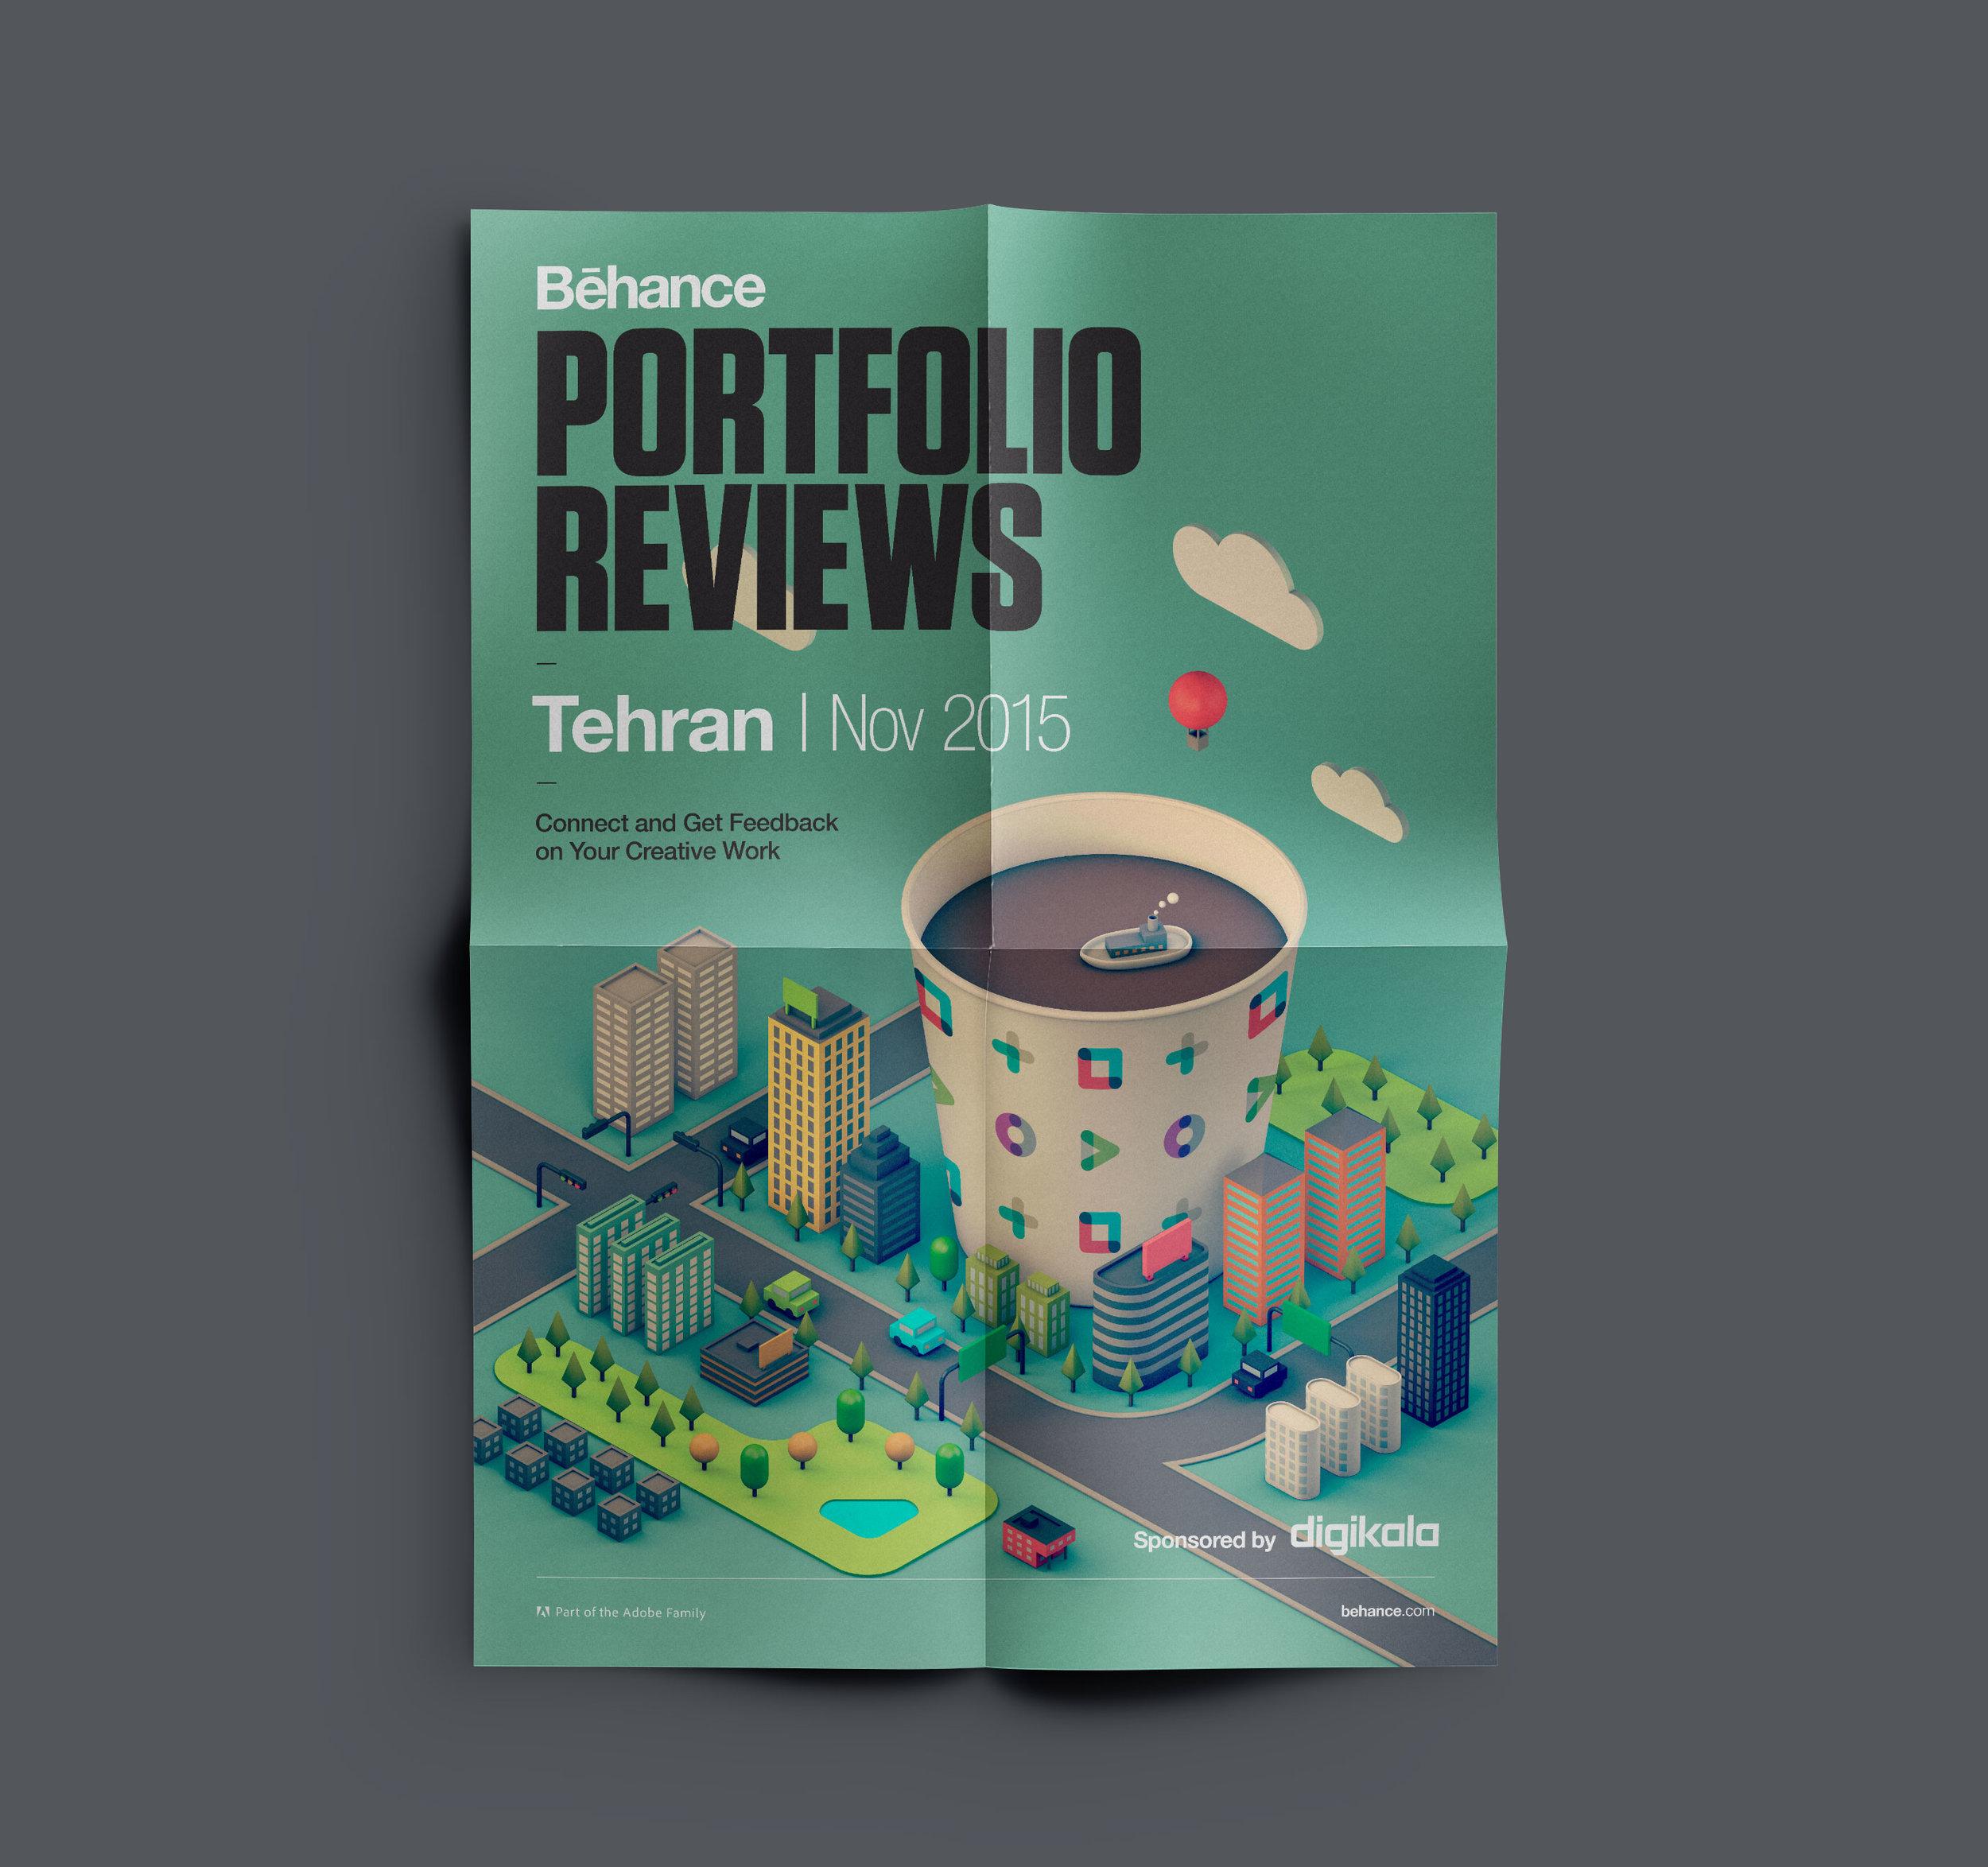 Be_Reviews_02_Poster.jpg